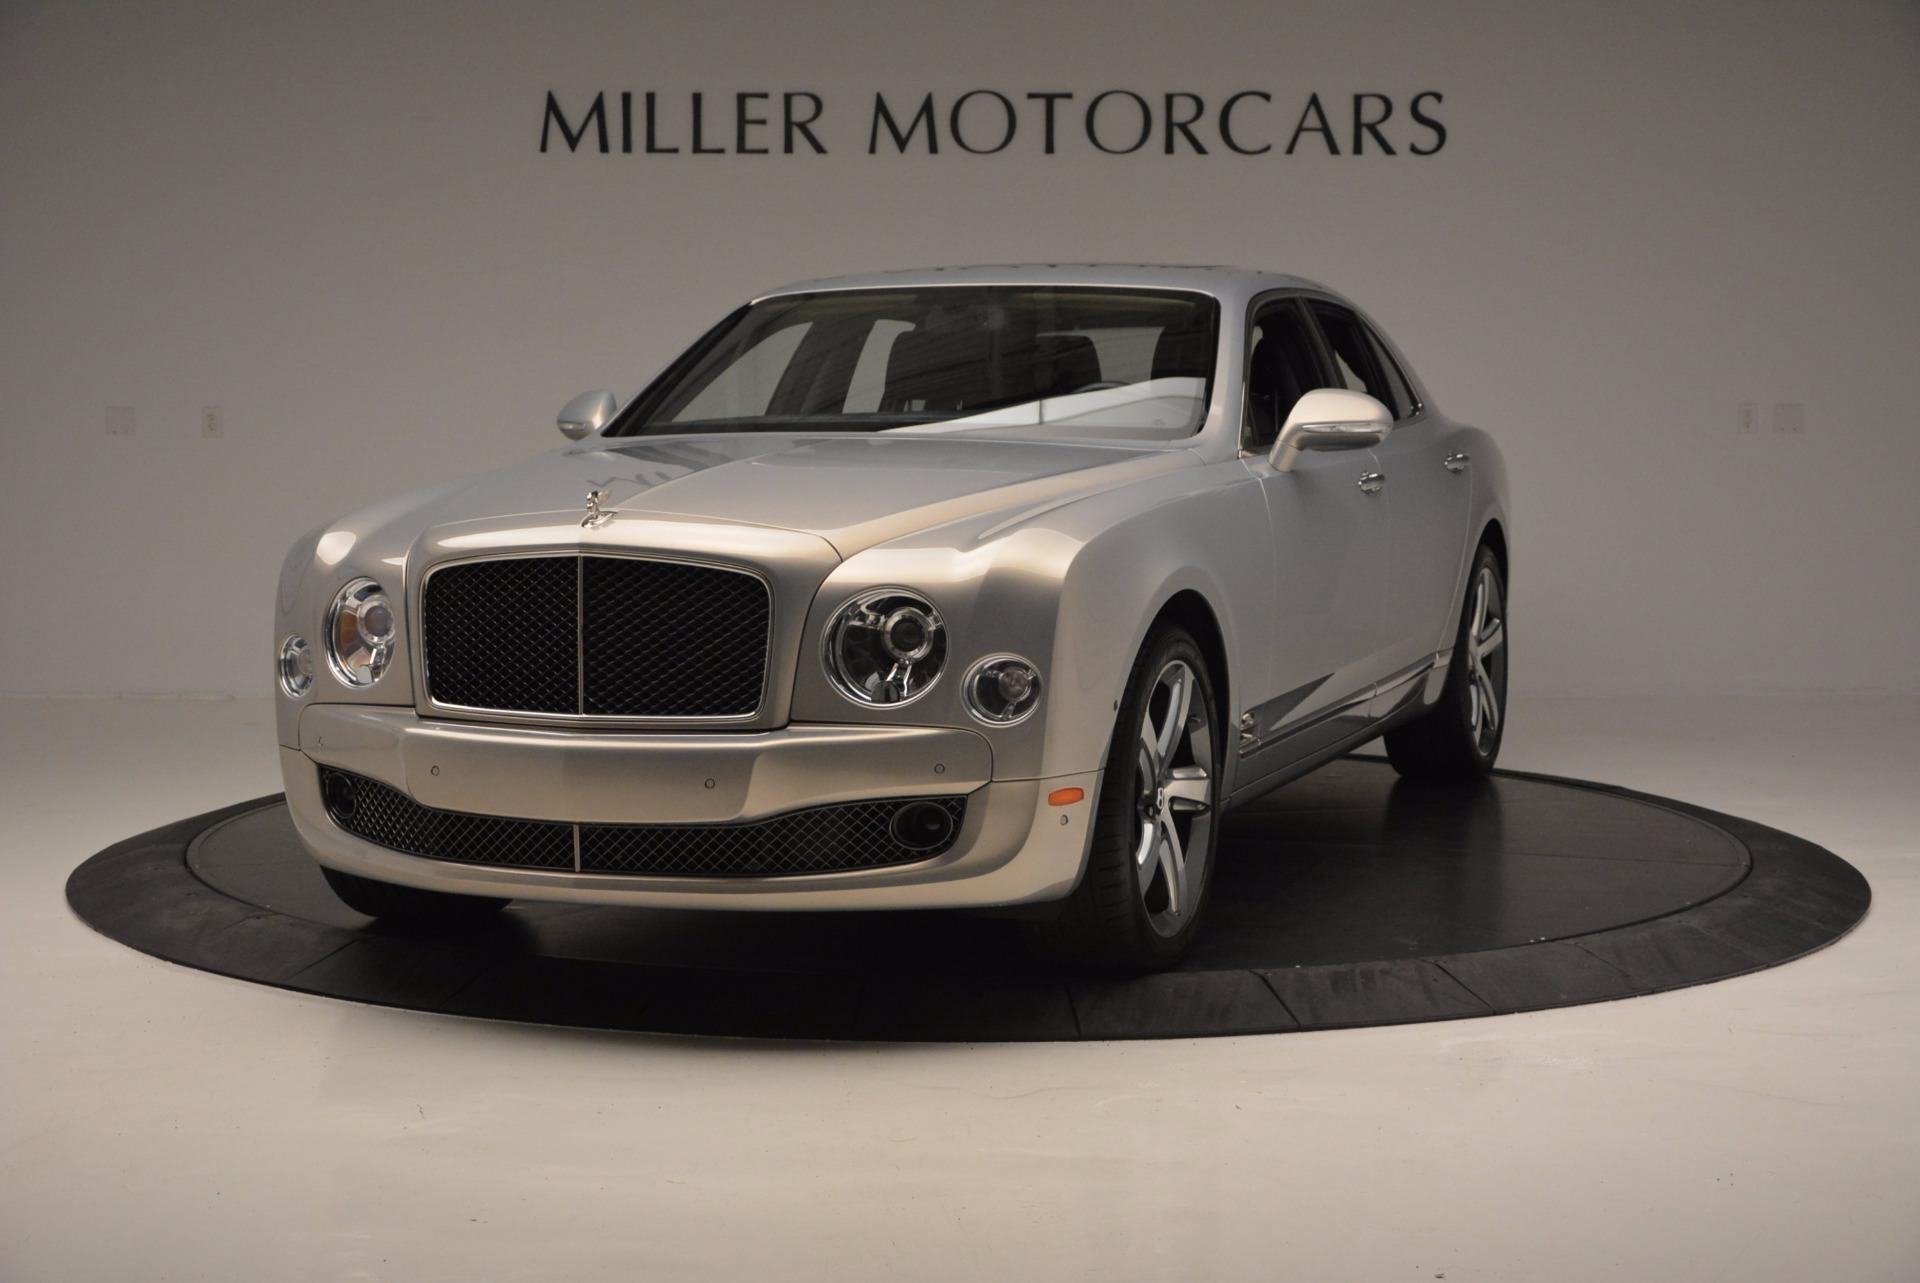 Used 2016 Bentley Mulsanne Speed For Sale In Greenwich, CT. Alfa Romeo of Greenwich, 7106 671_main